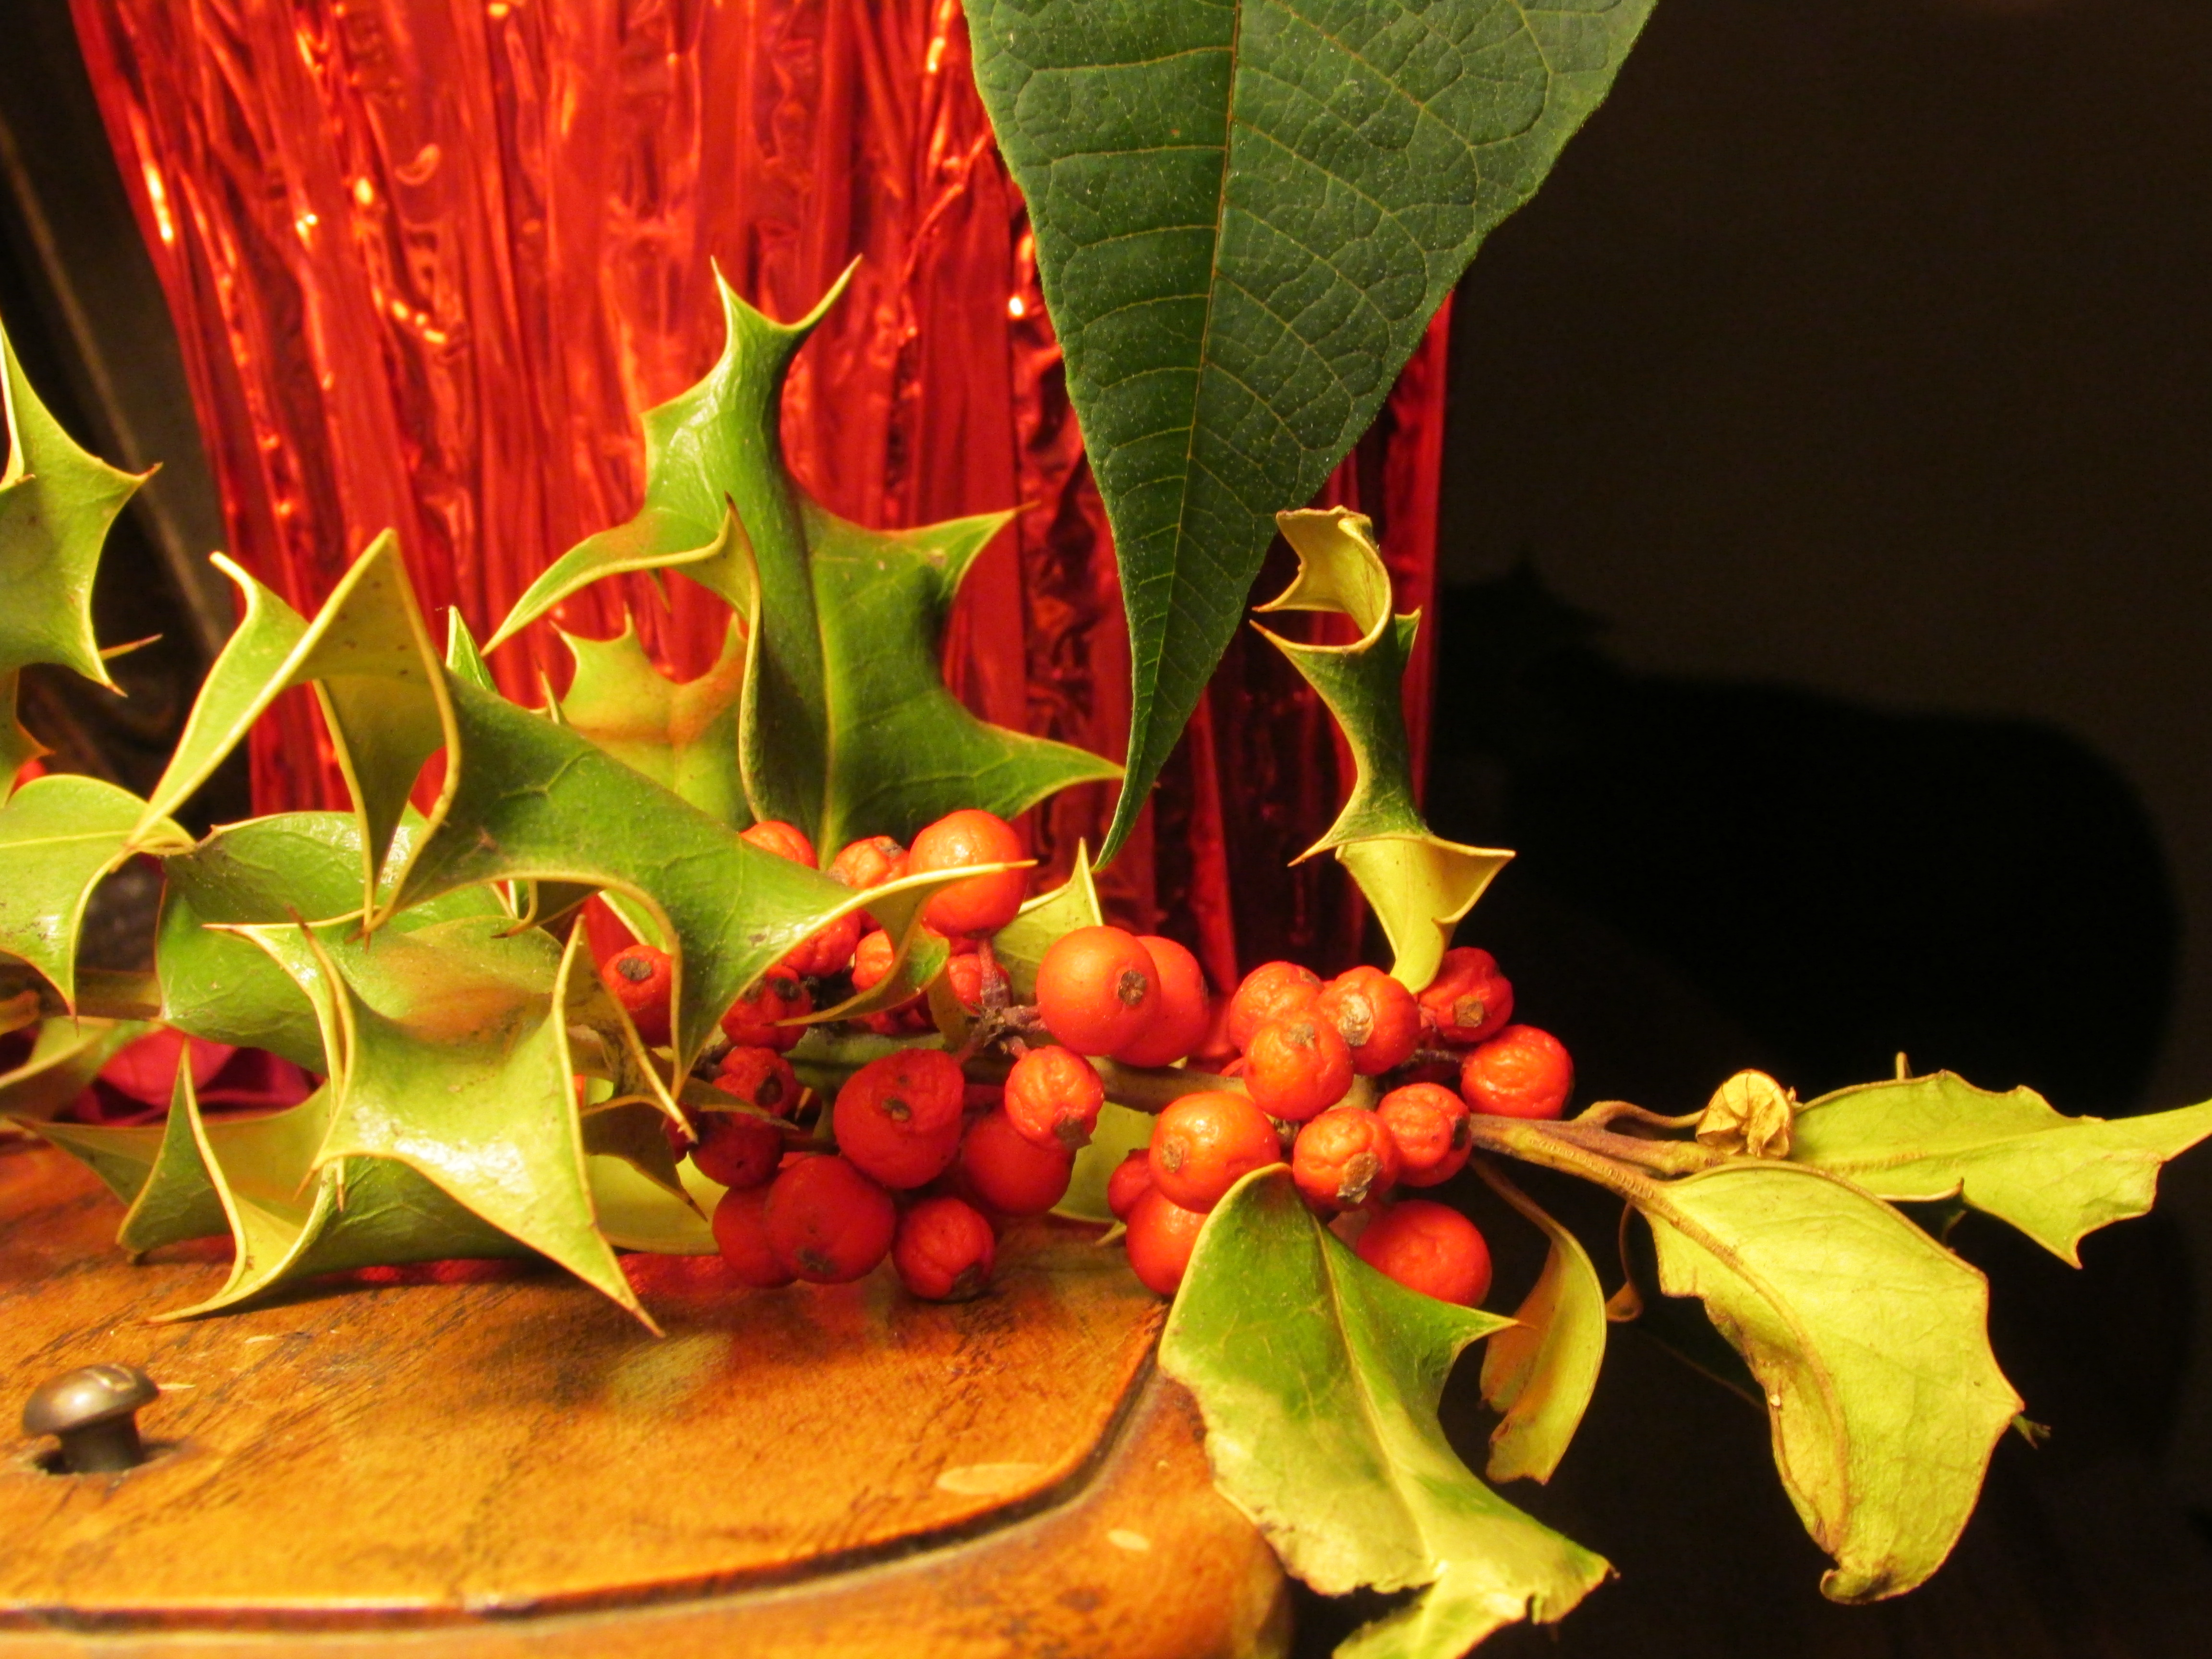 Christmas greetings (c) Christine Sine